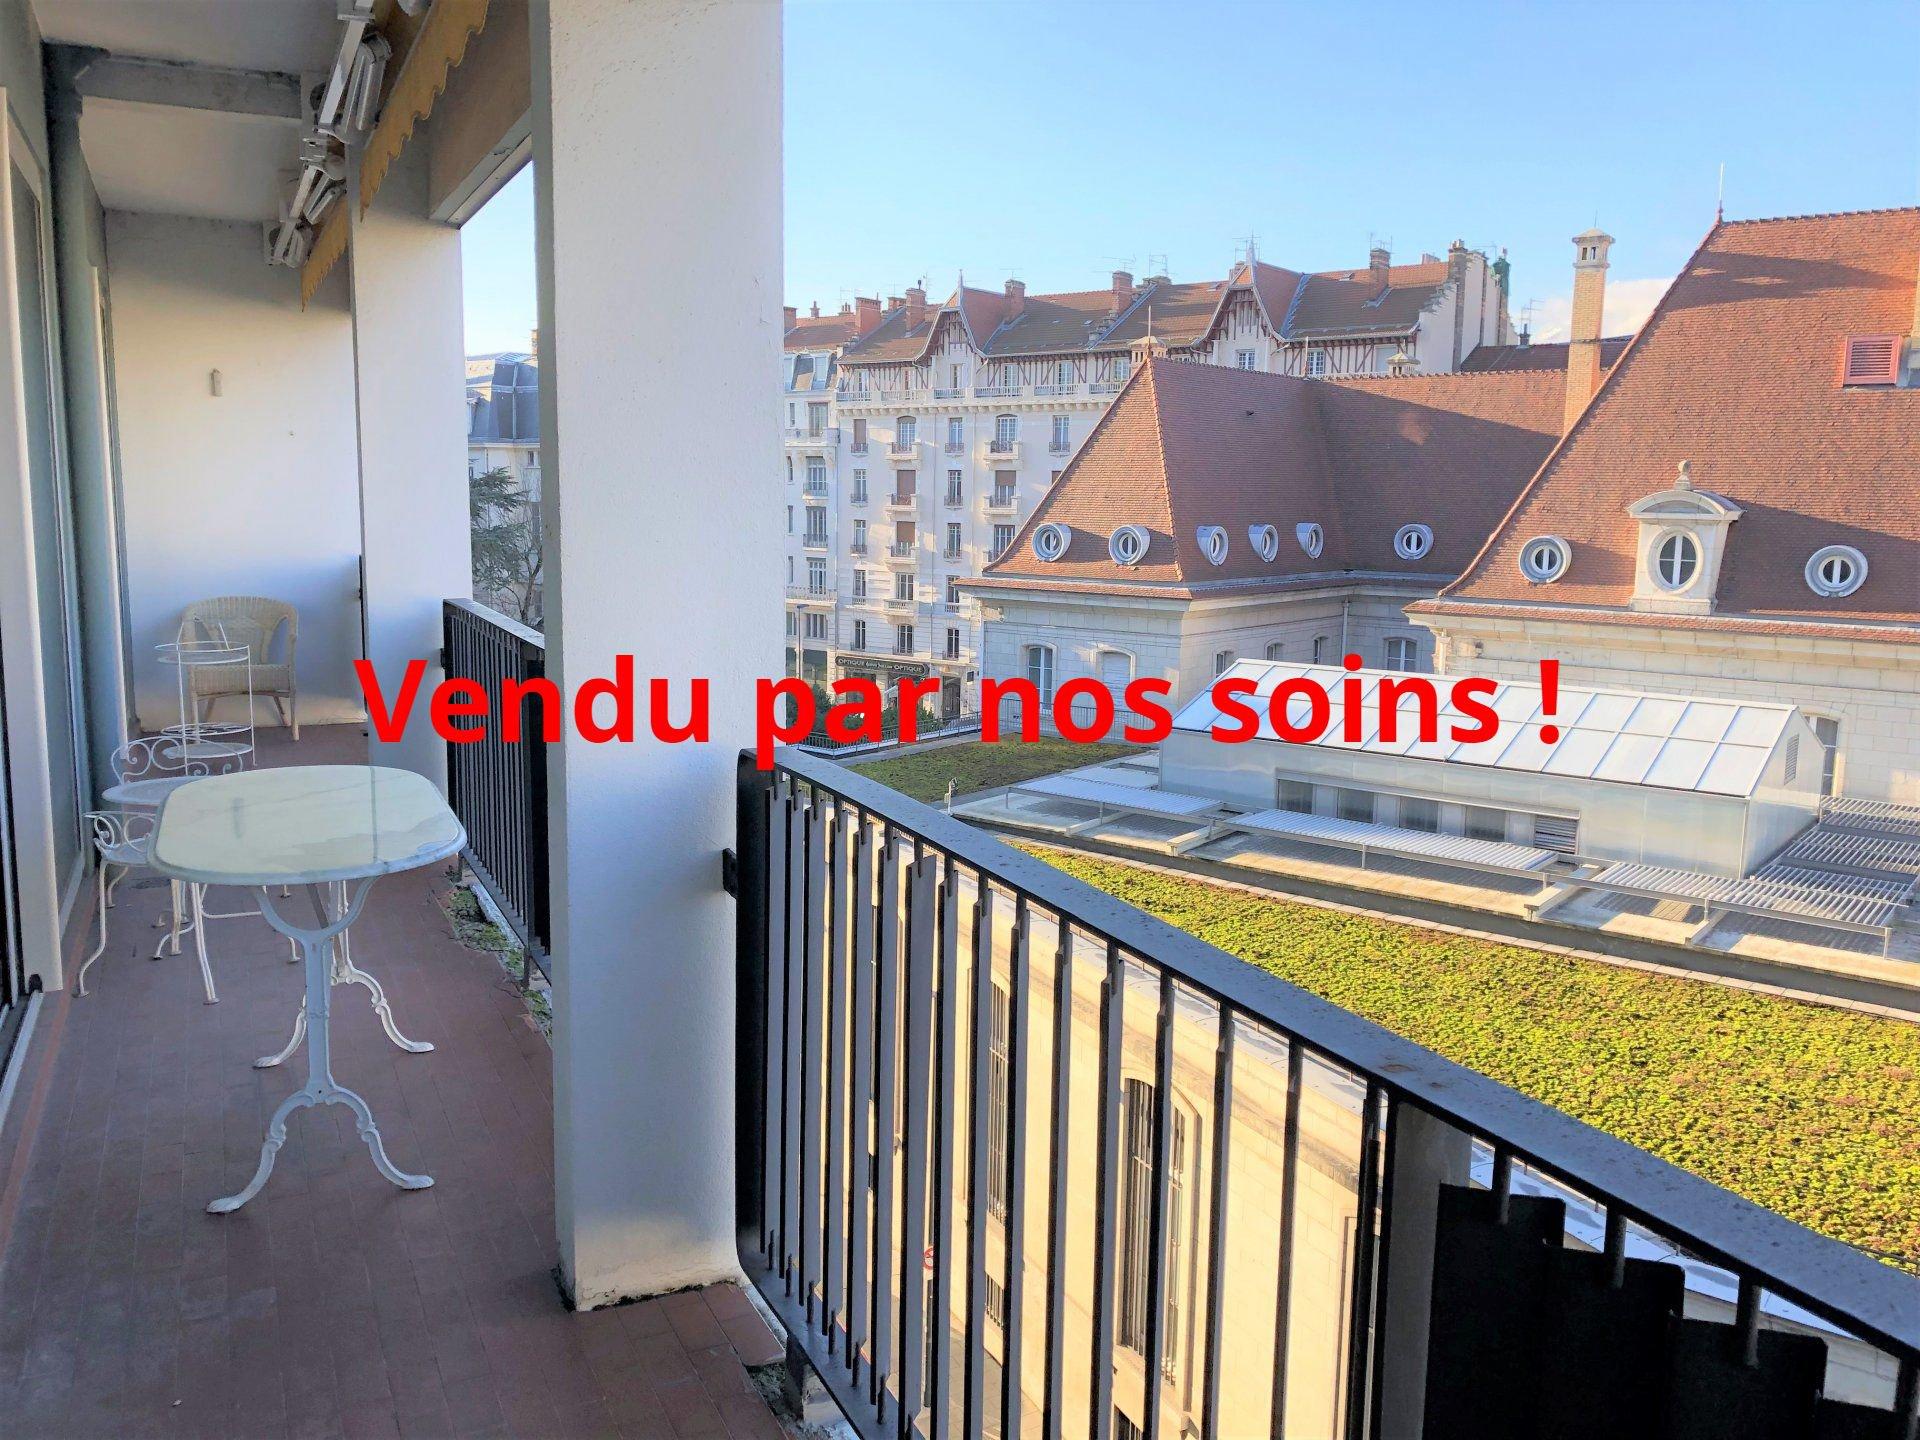 Vue par dessus les toits de la Banque de France !